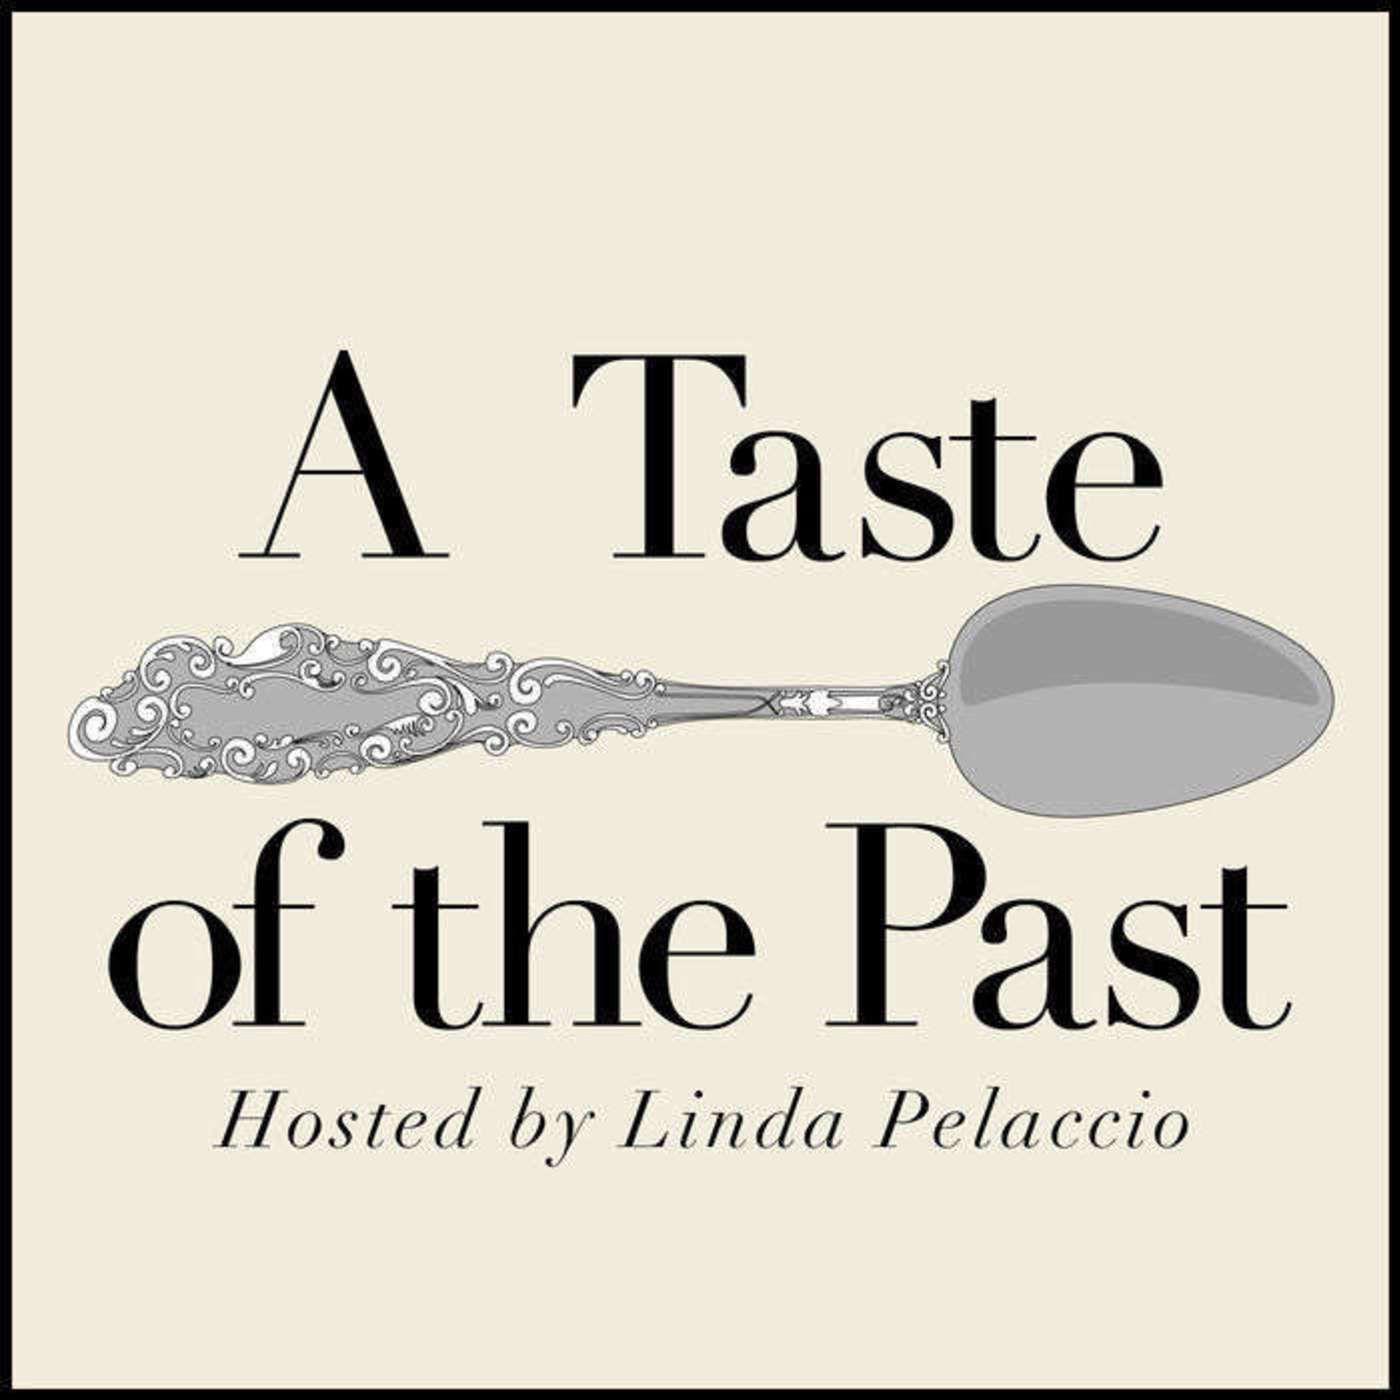 Episode 101: Julia Child's 100th Birthday